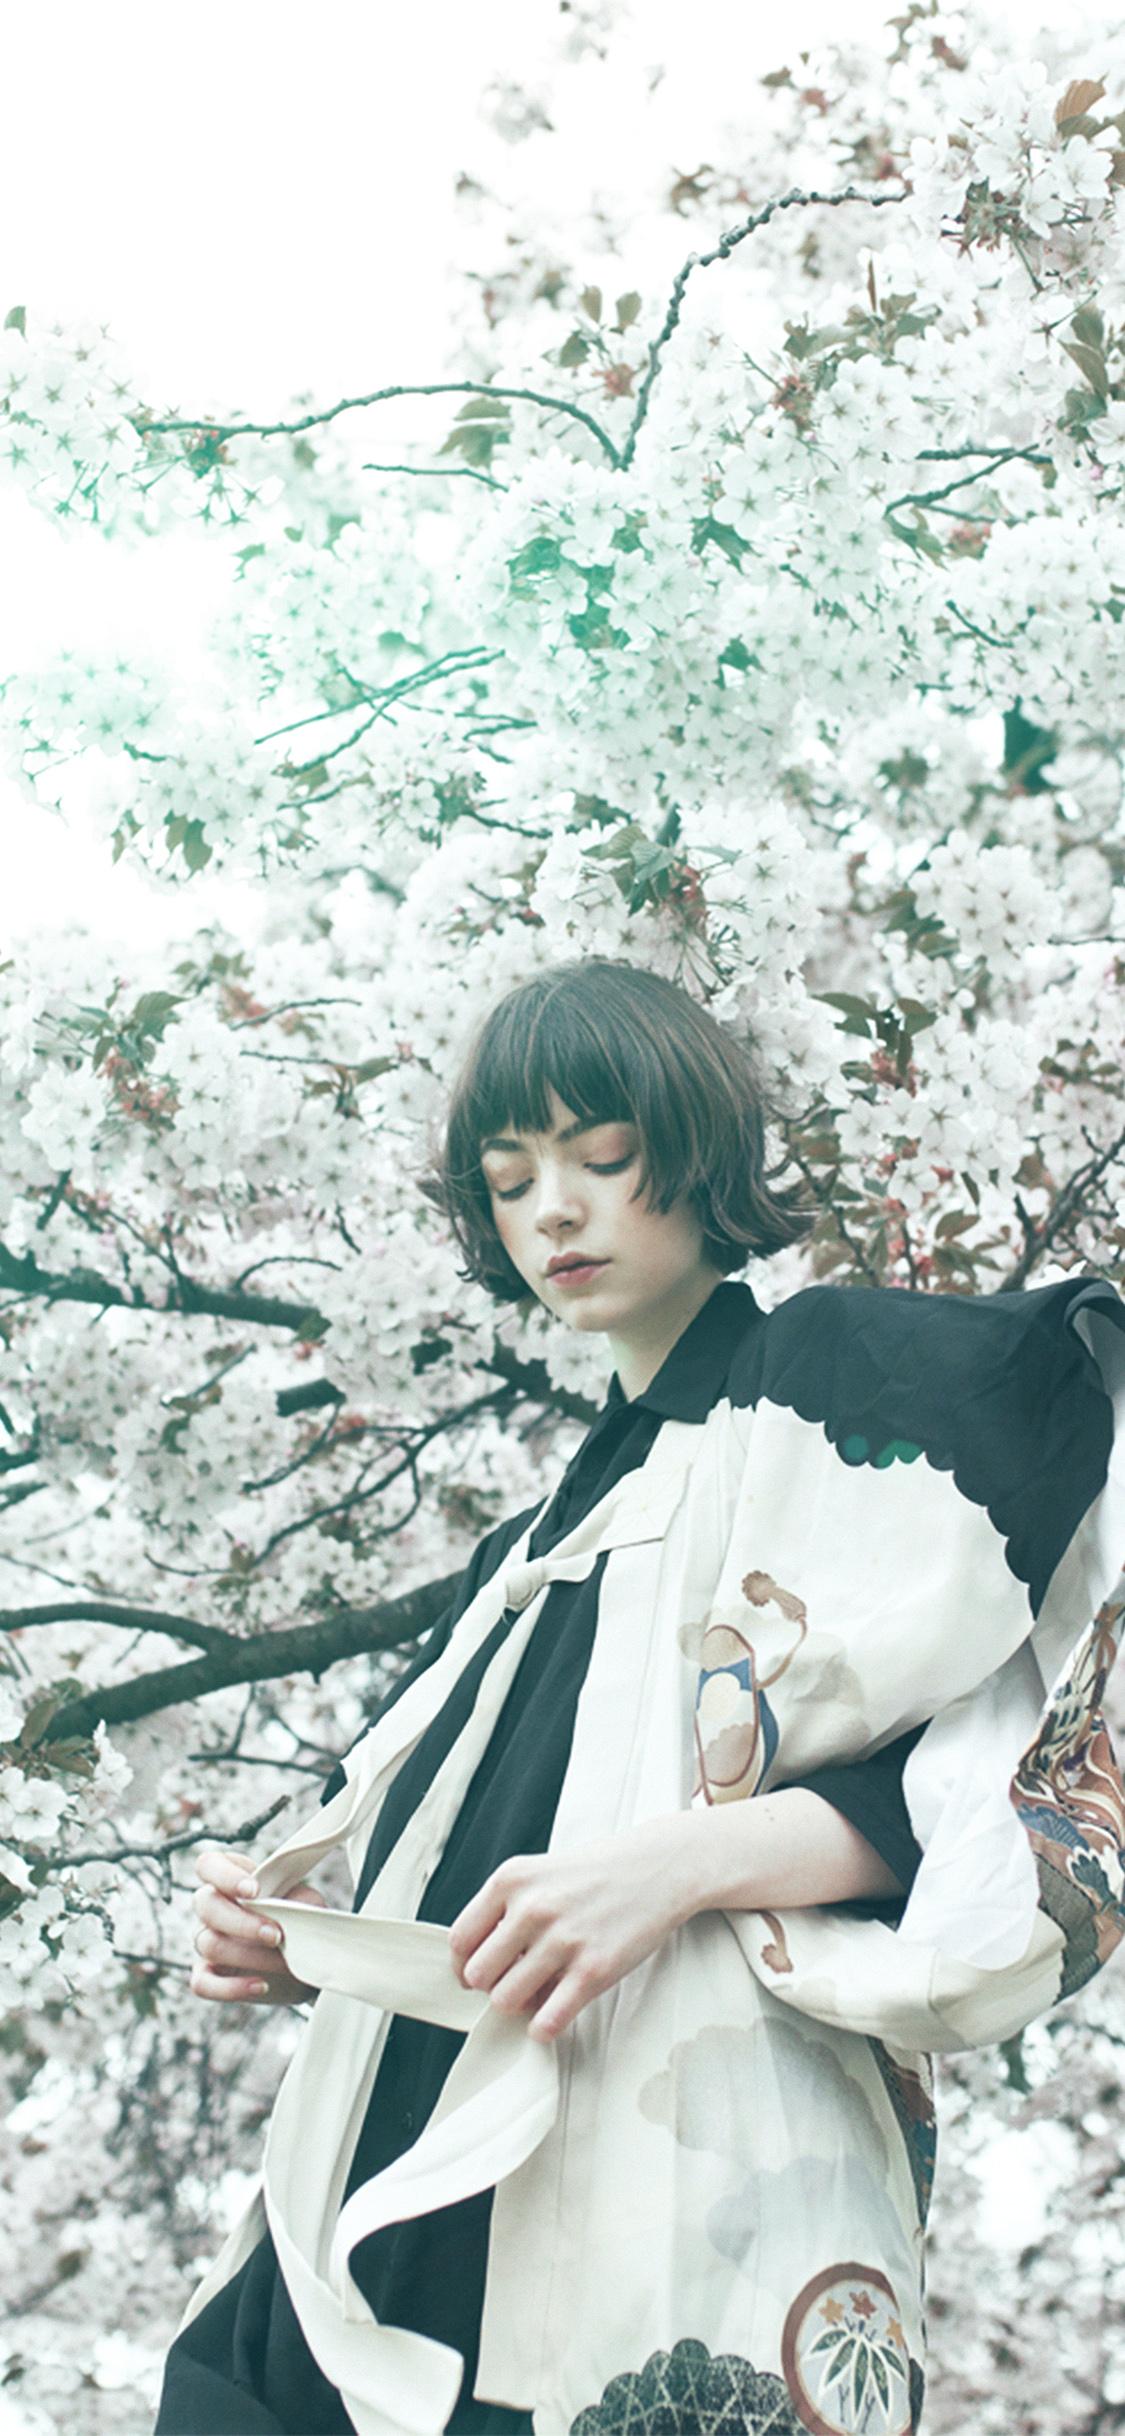 iPhonexpapers.com-Apple-iPhone-wallpaper-ay90-spring-blossom-girl-illustration-art-green